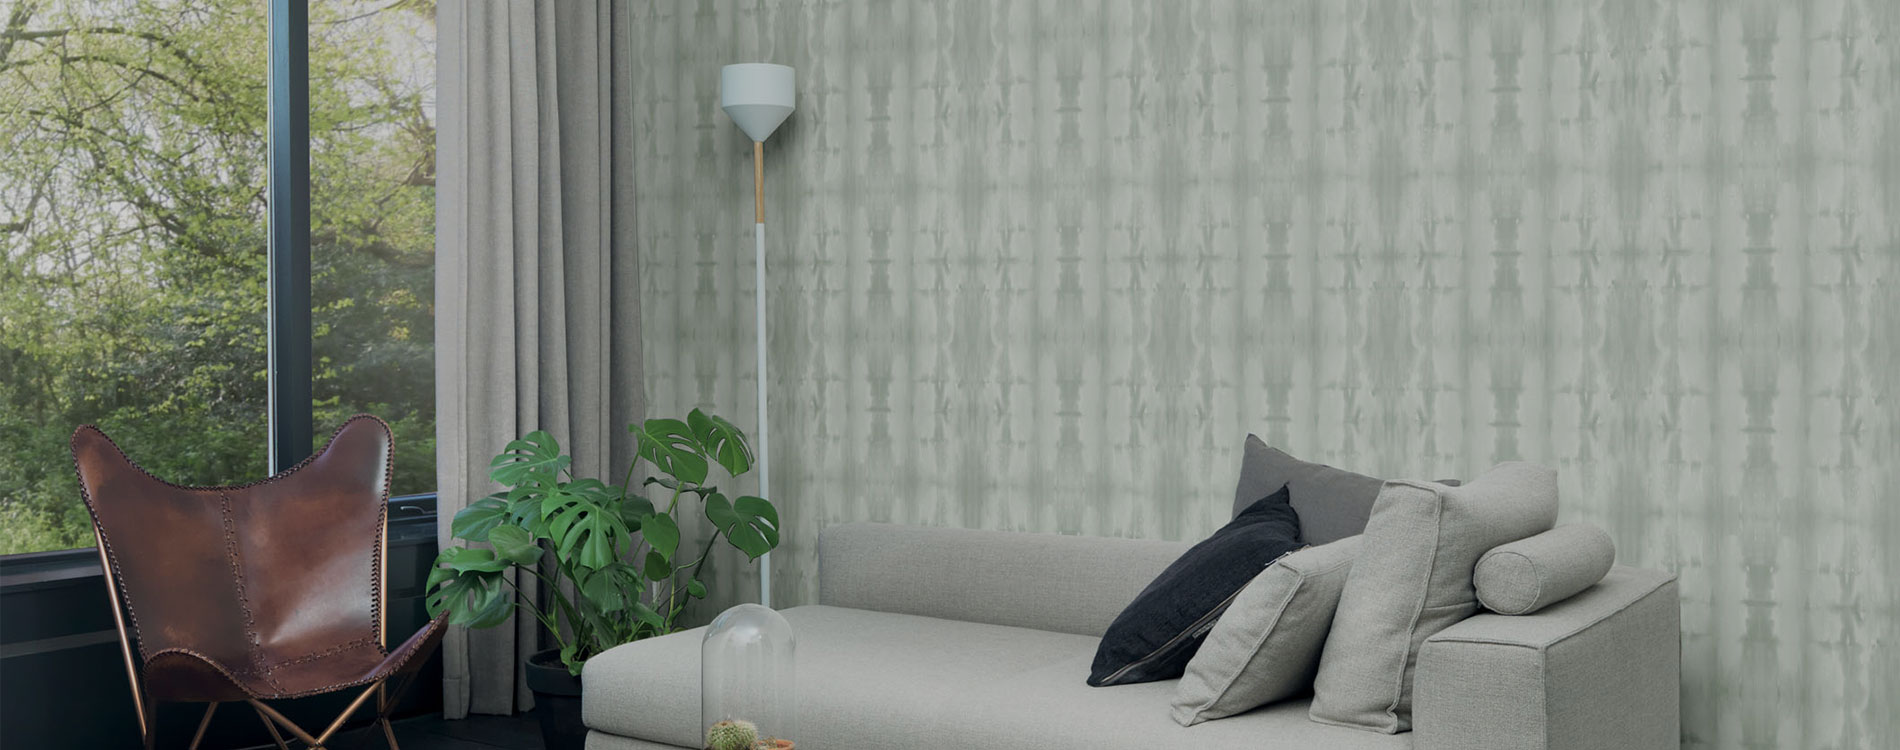 kltebrcke beseitigen best cheap with trockenbau regal with kltebrcke beseitigen cool regal als. Black Bedroom Furniture Sets. Home Design Ideas